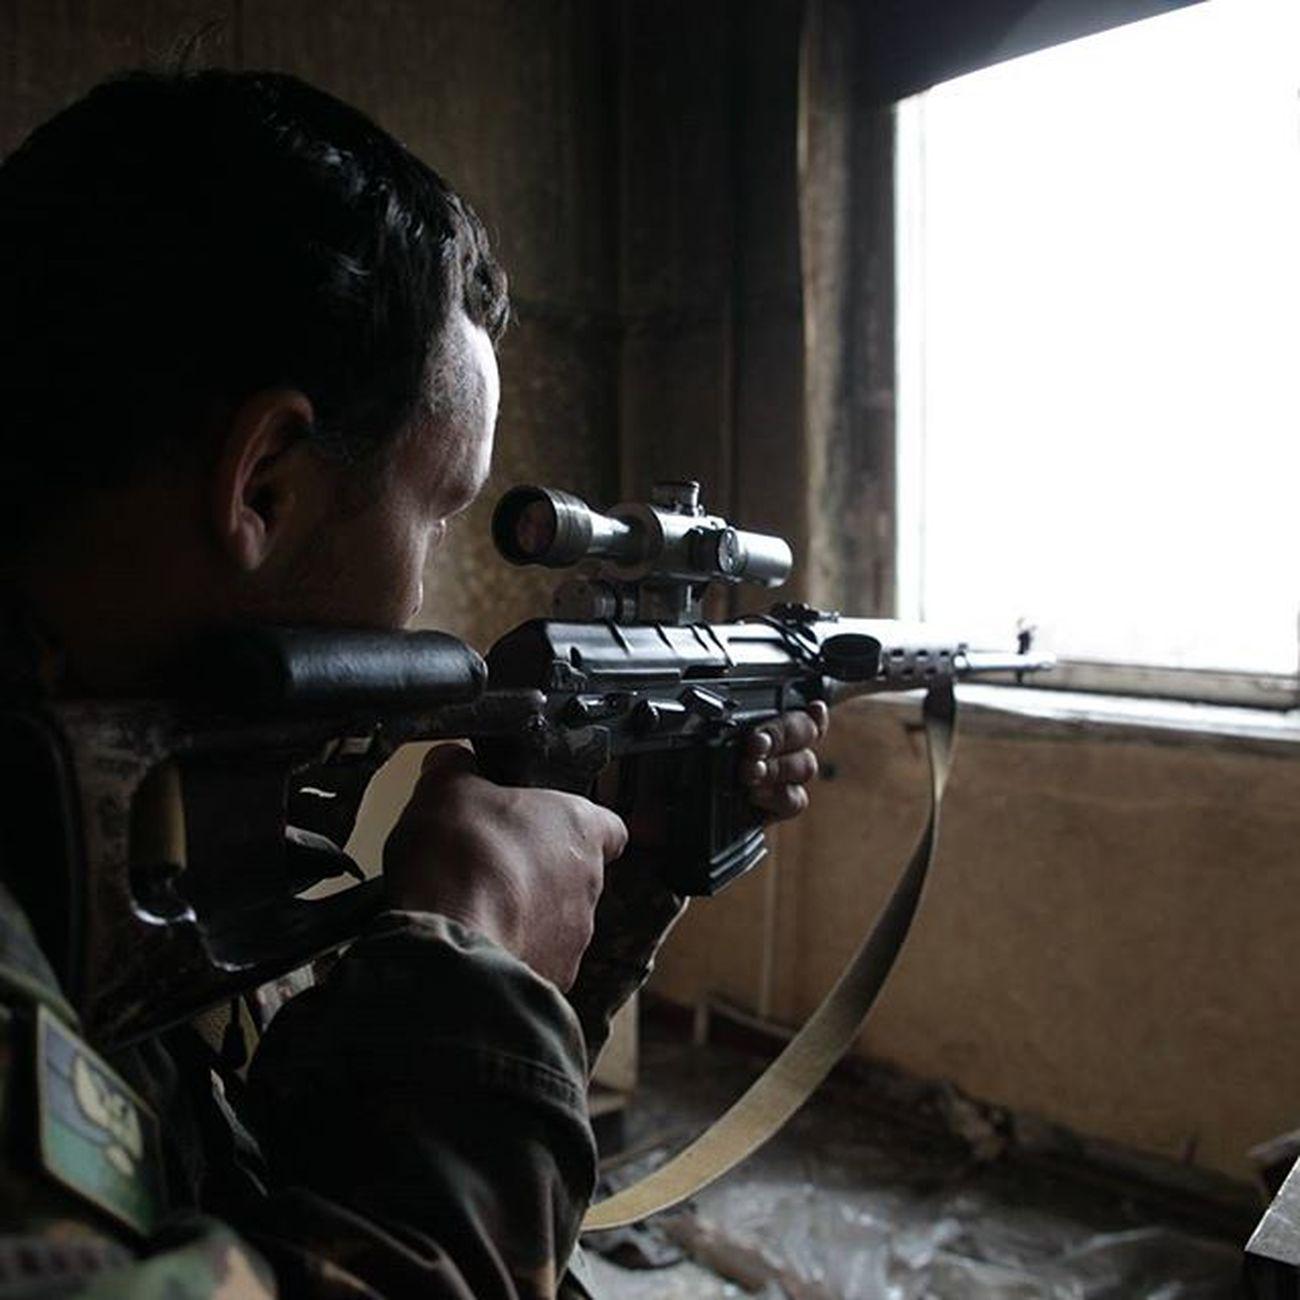 Работаем свд сахасирэ снайпер сахаорда Якутия Sniper Marksman Svd Onduty PewPewPew Sakha Ykt Ykt14 Yakutia Bootur